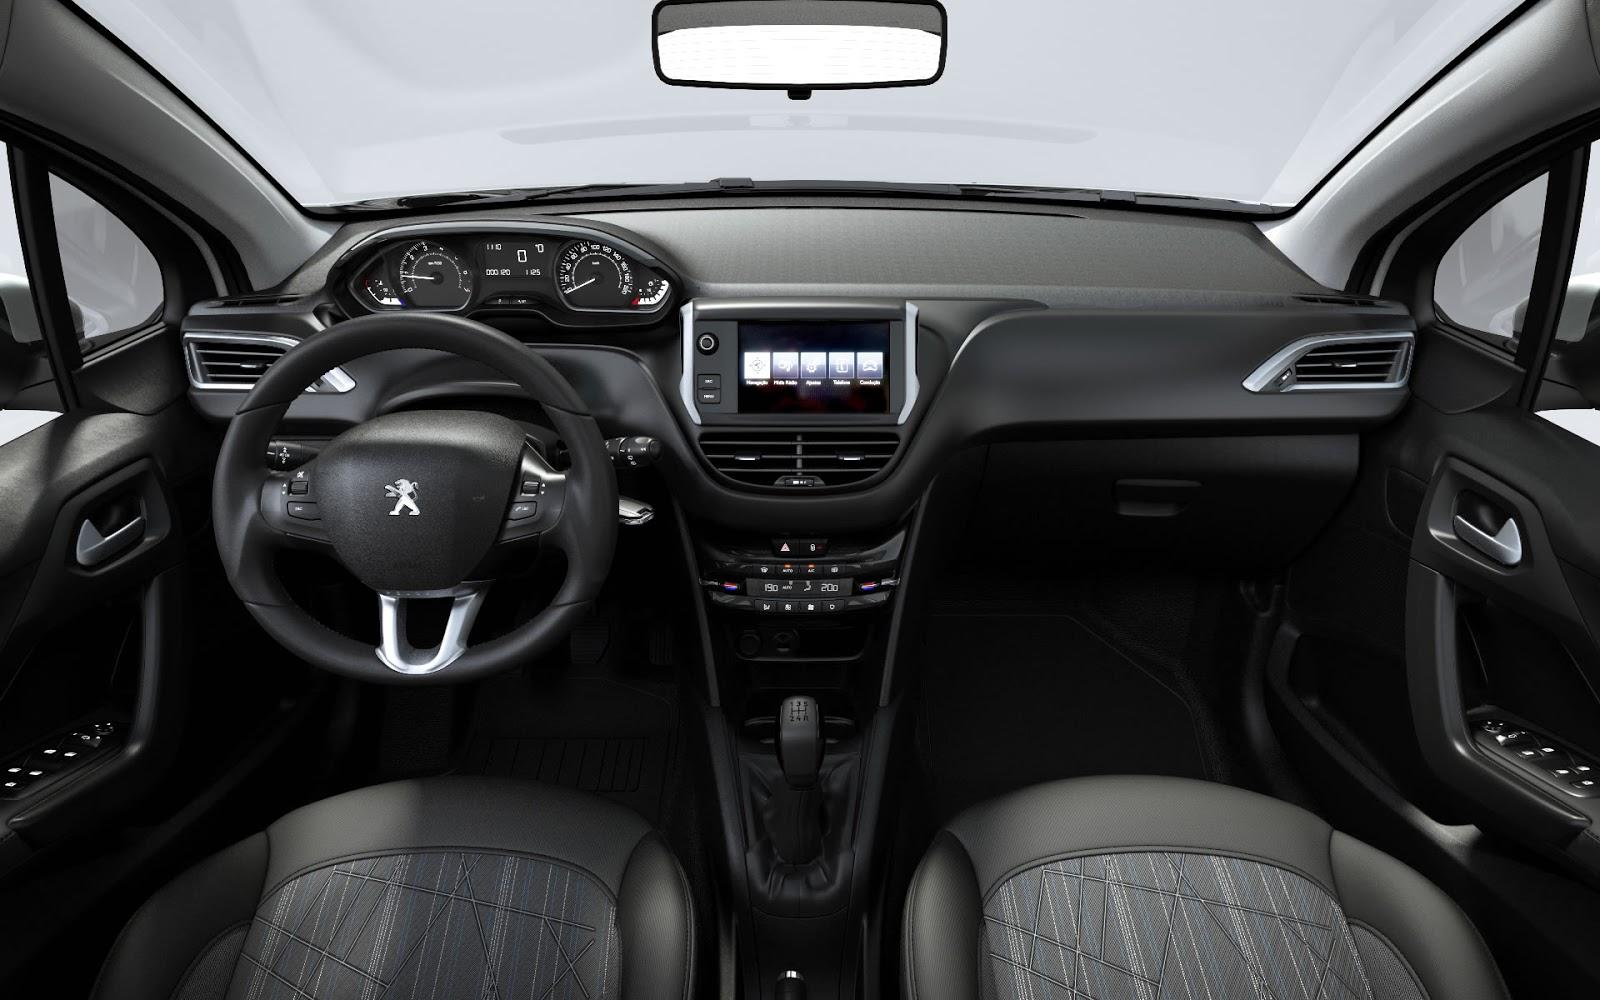 Peugeot 208 InConcert